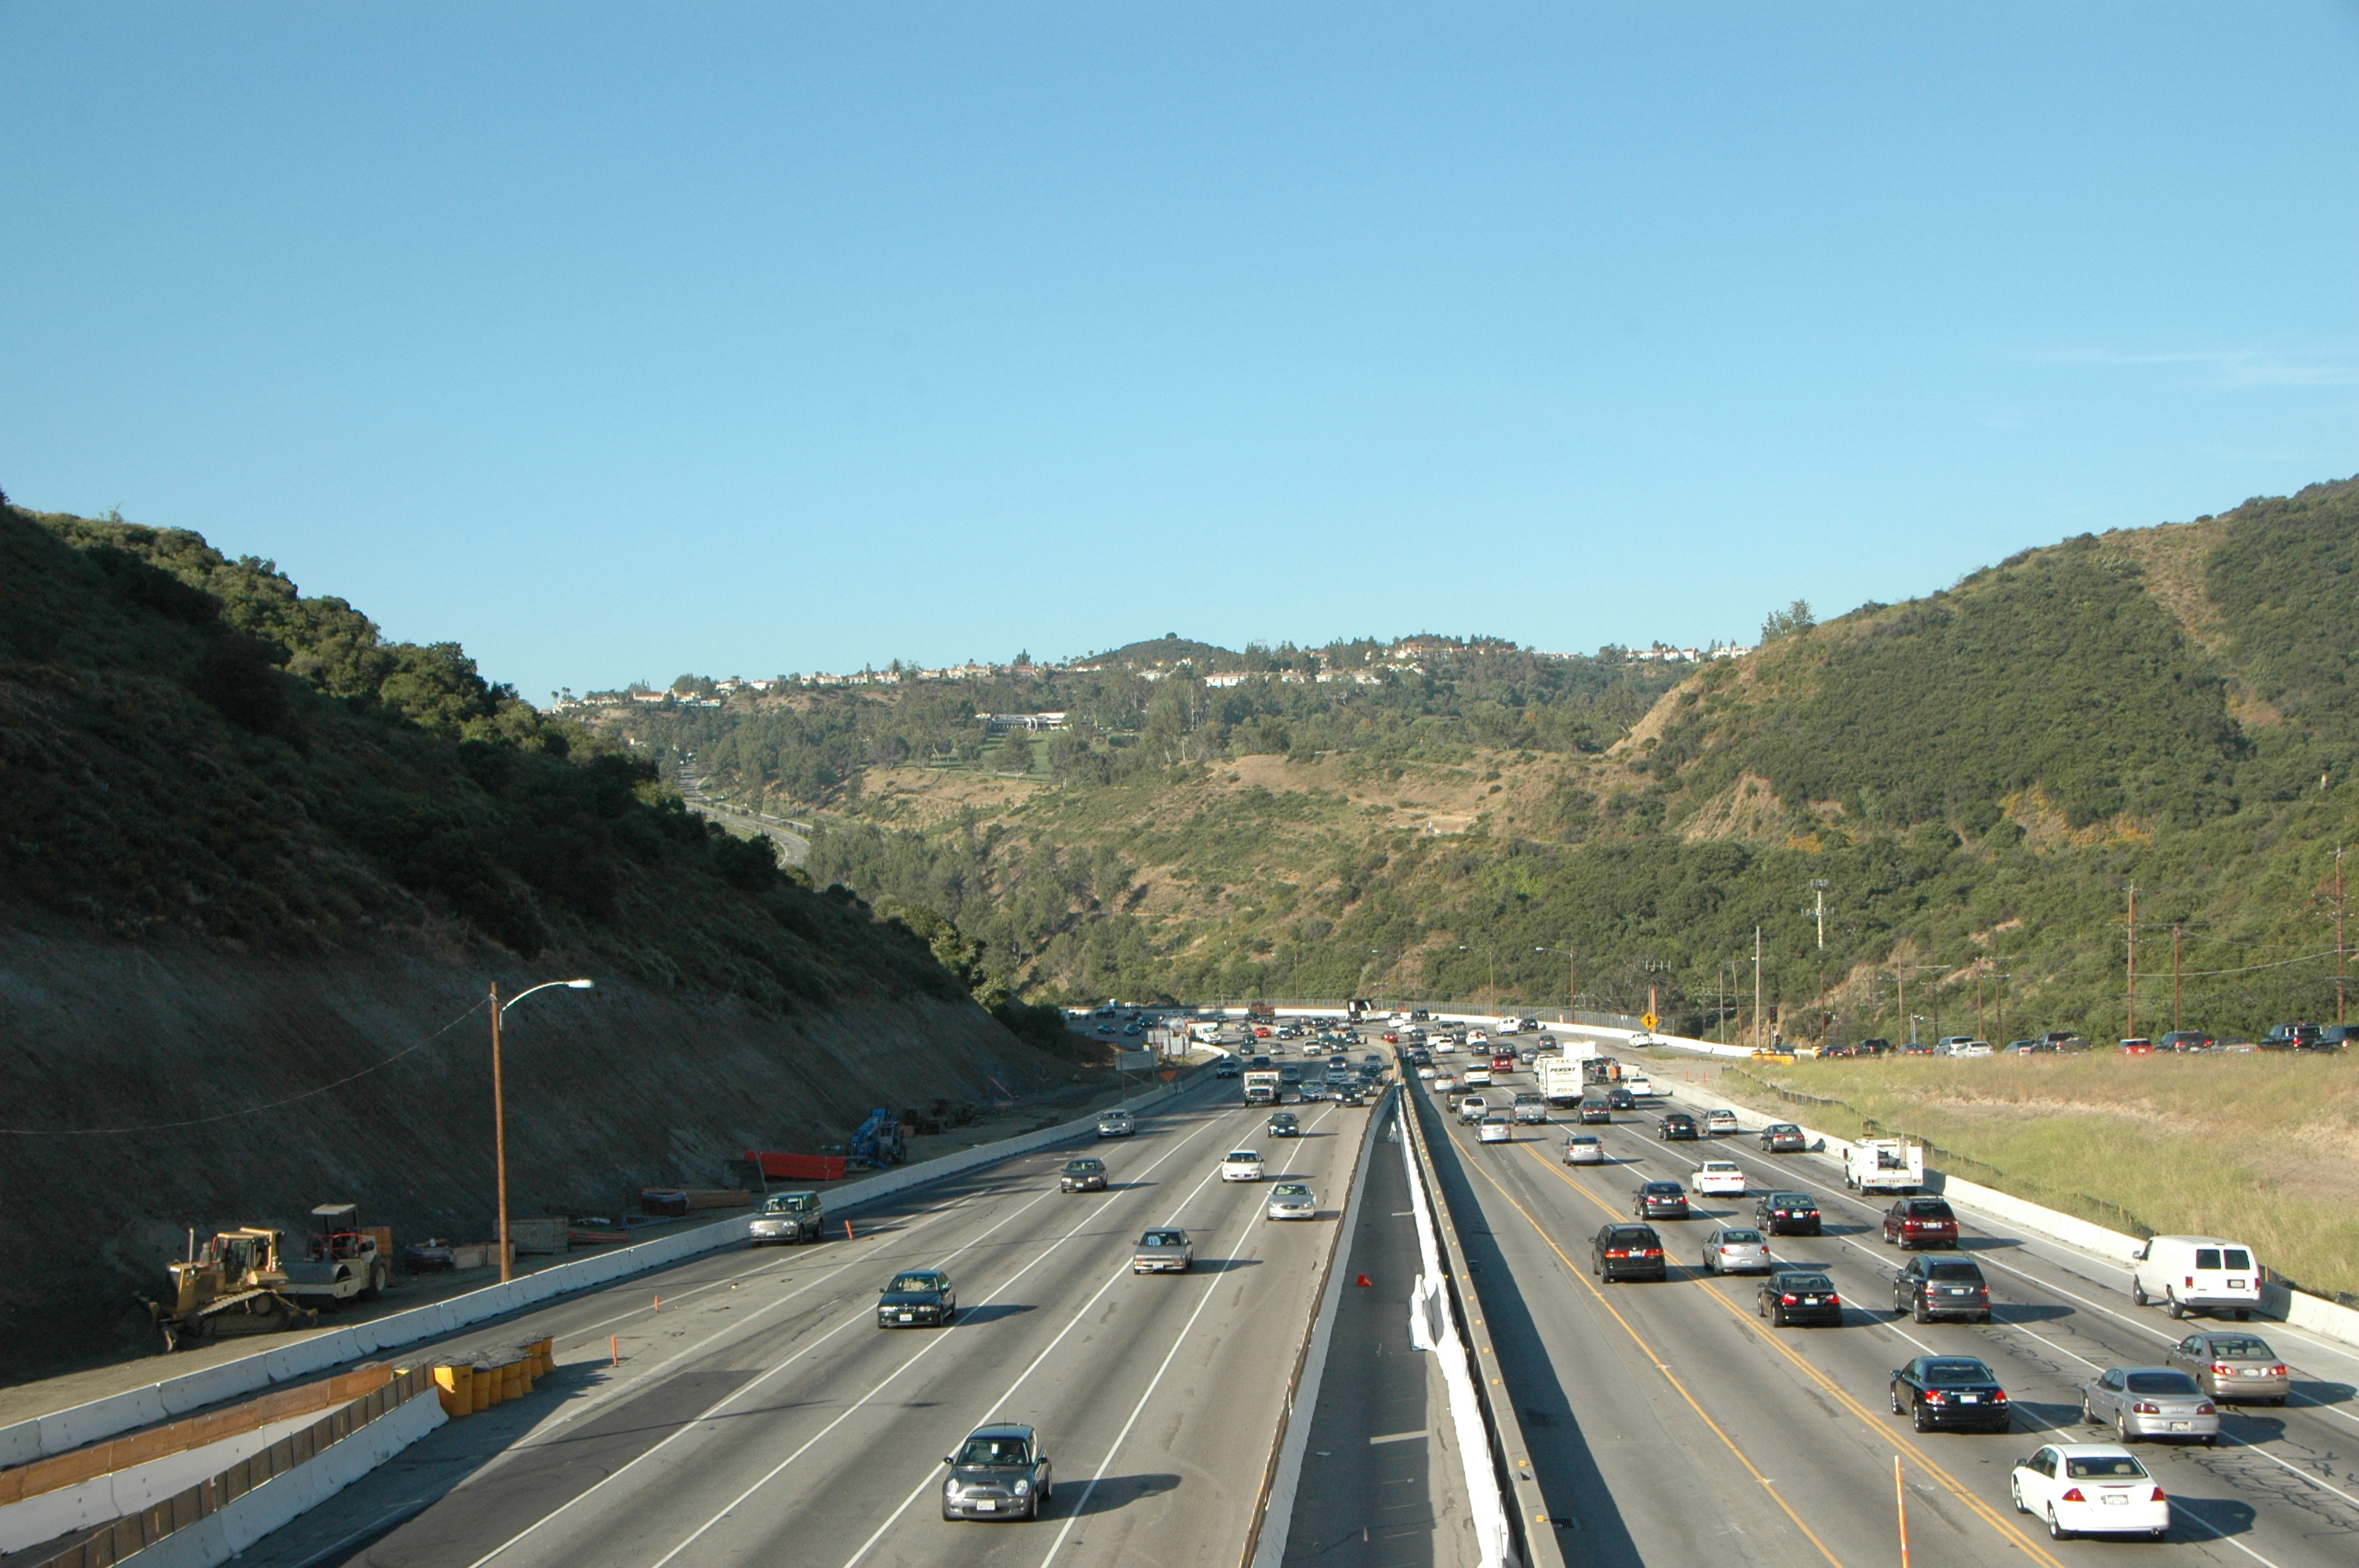 Tráfico en la autopista I-405 en el Paso Sepúlveda. (Foto José Ubaldo/Metro)